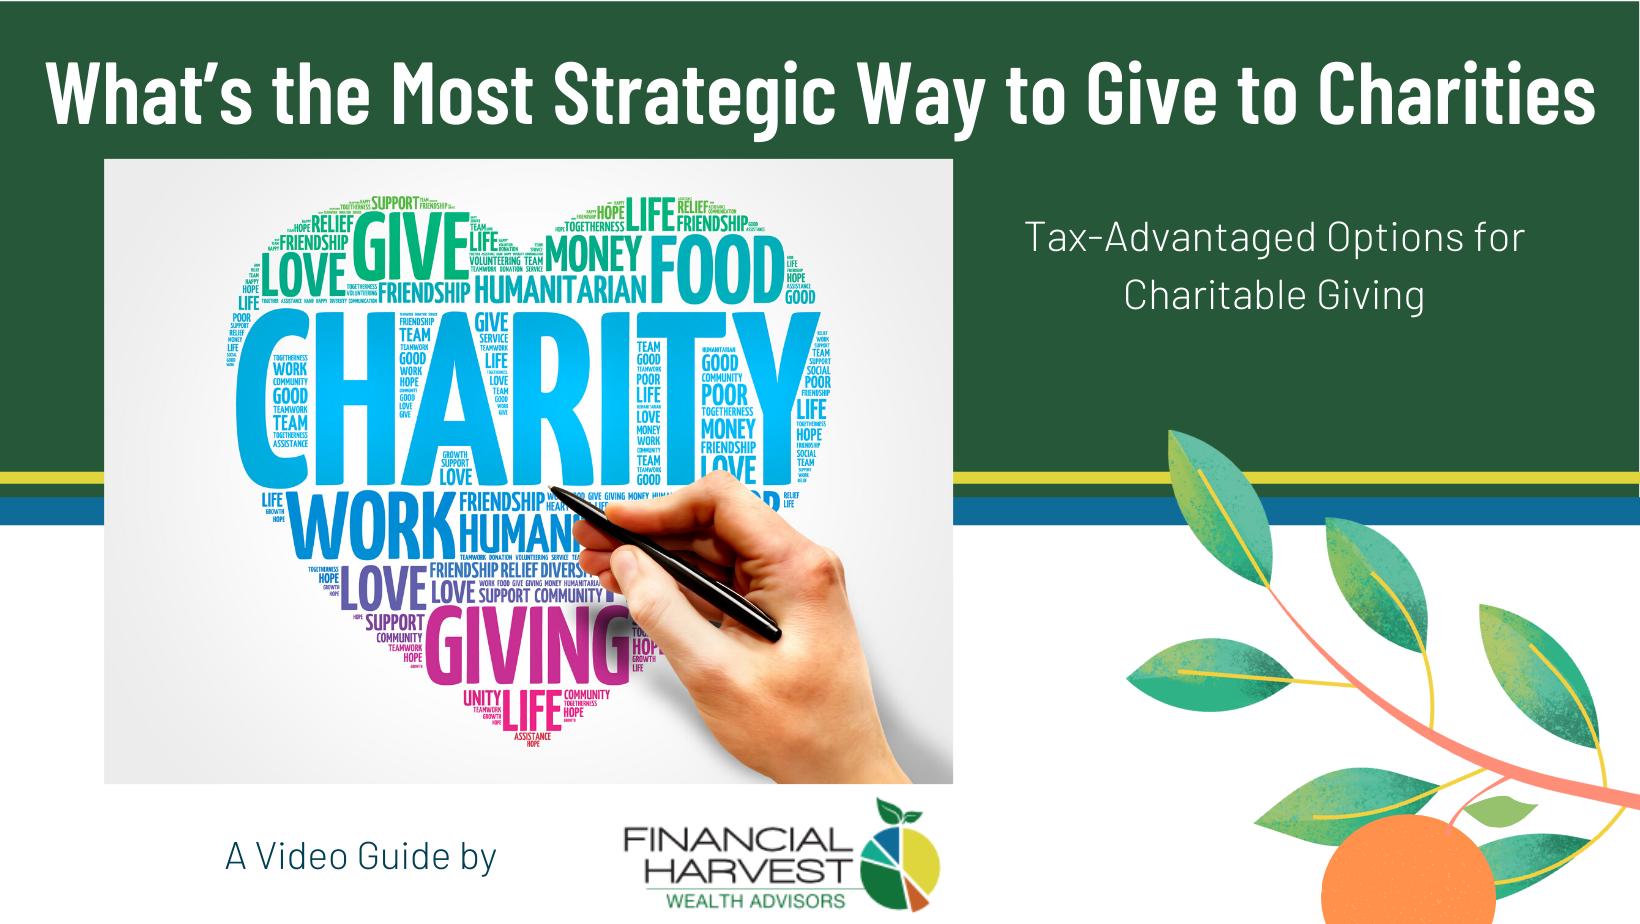 Video guide: tax-advantaged strategic charitable giving - 3 key tips